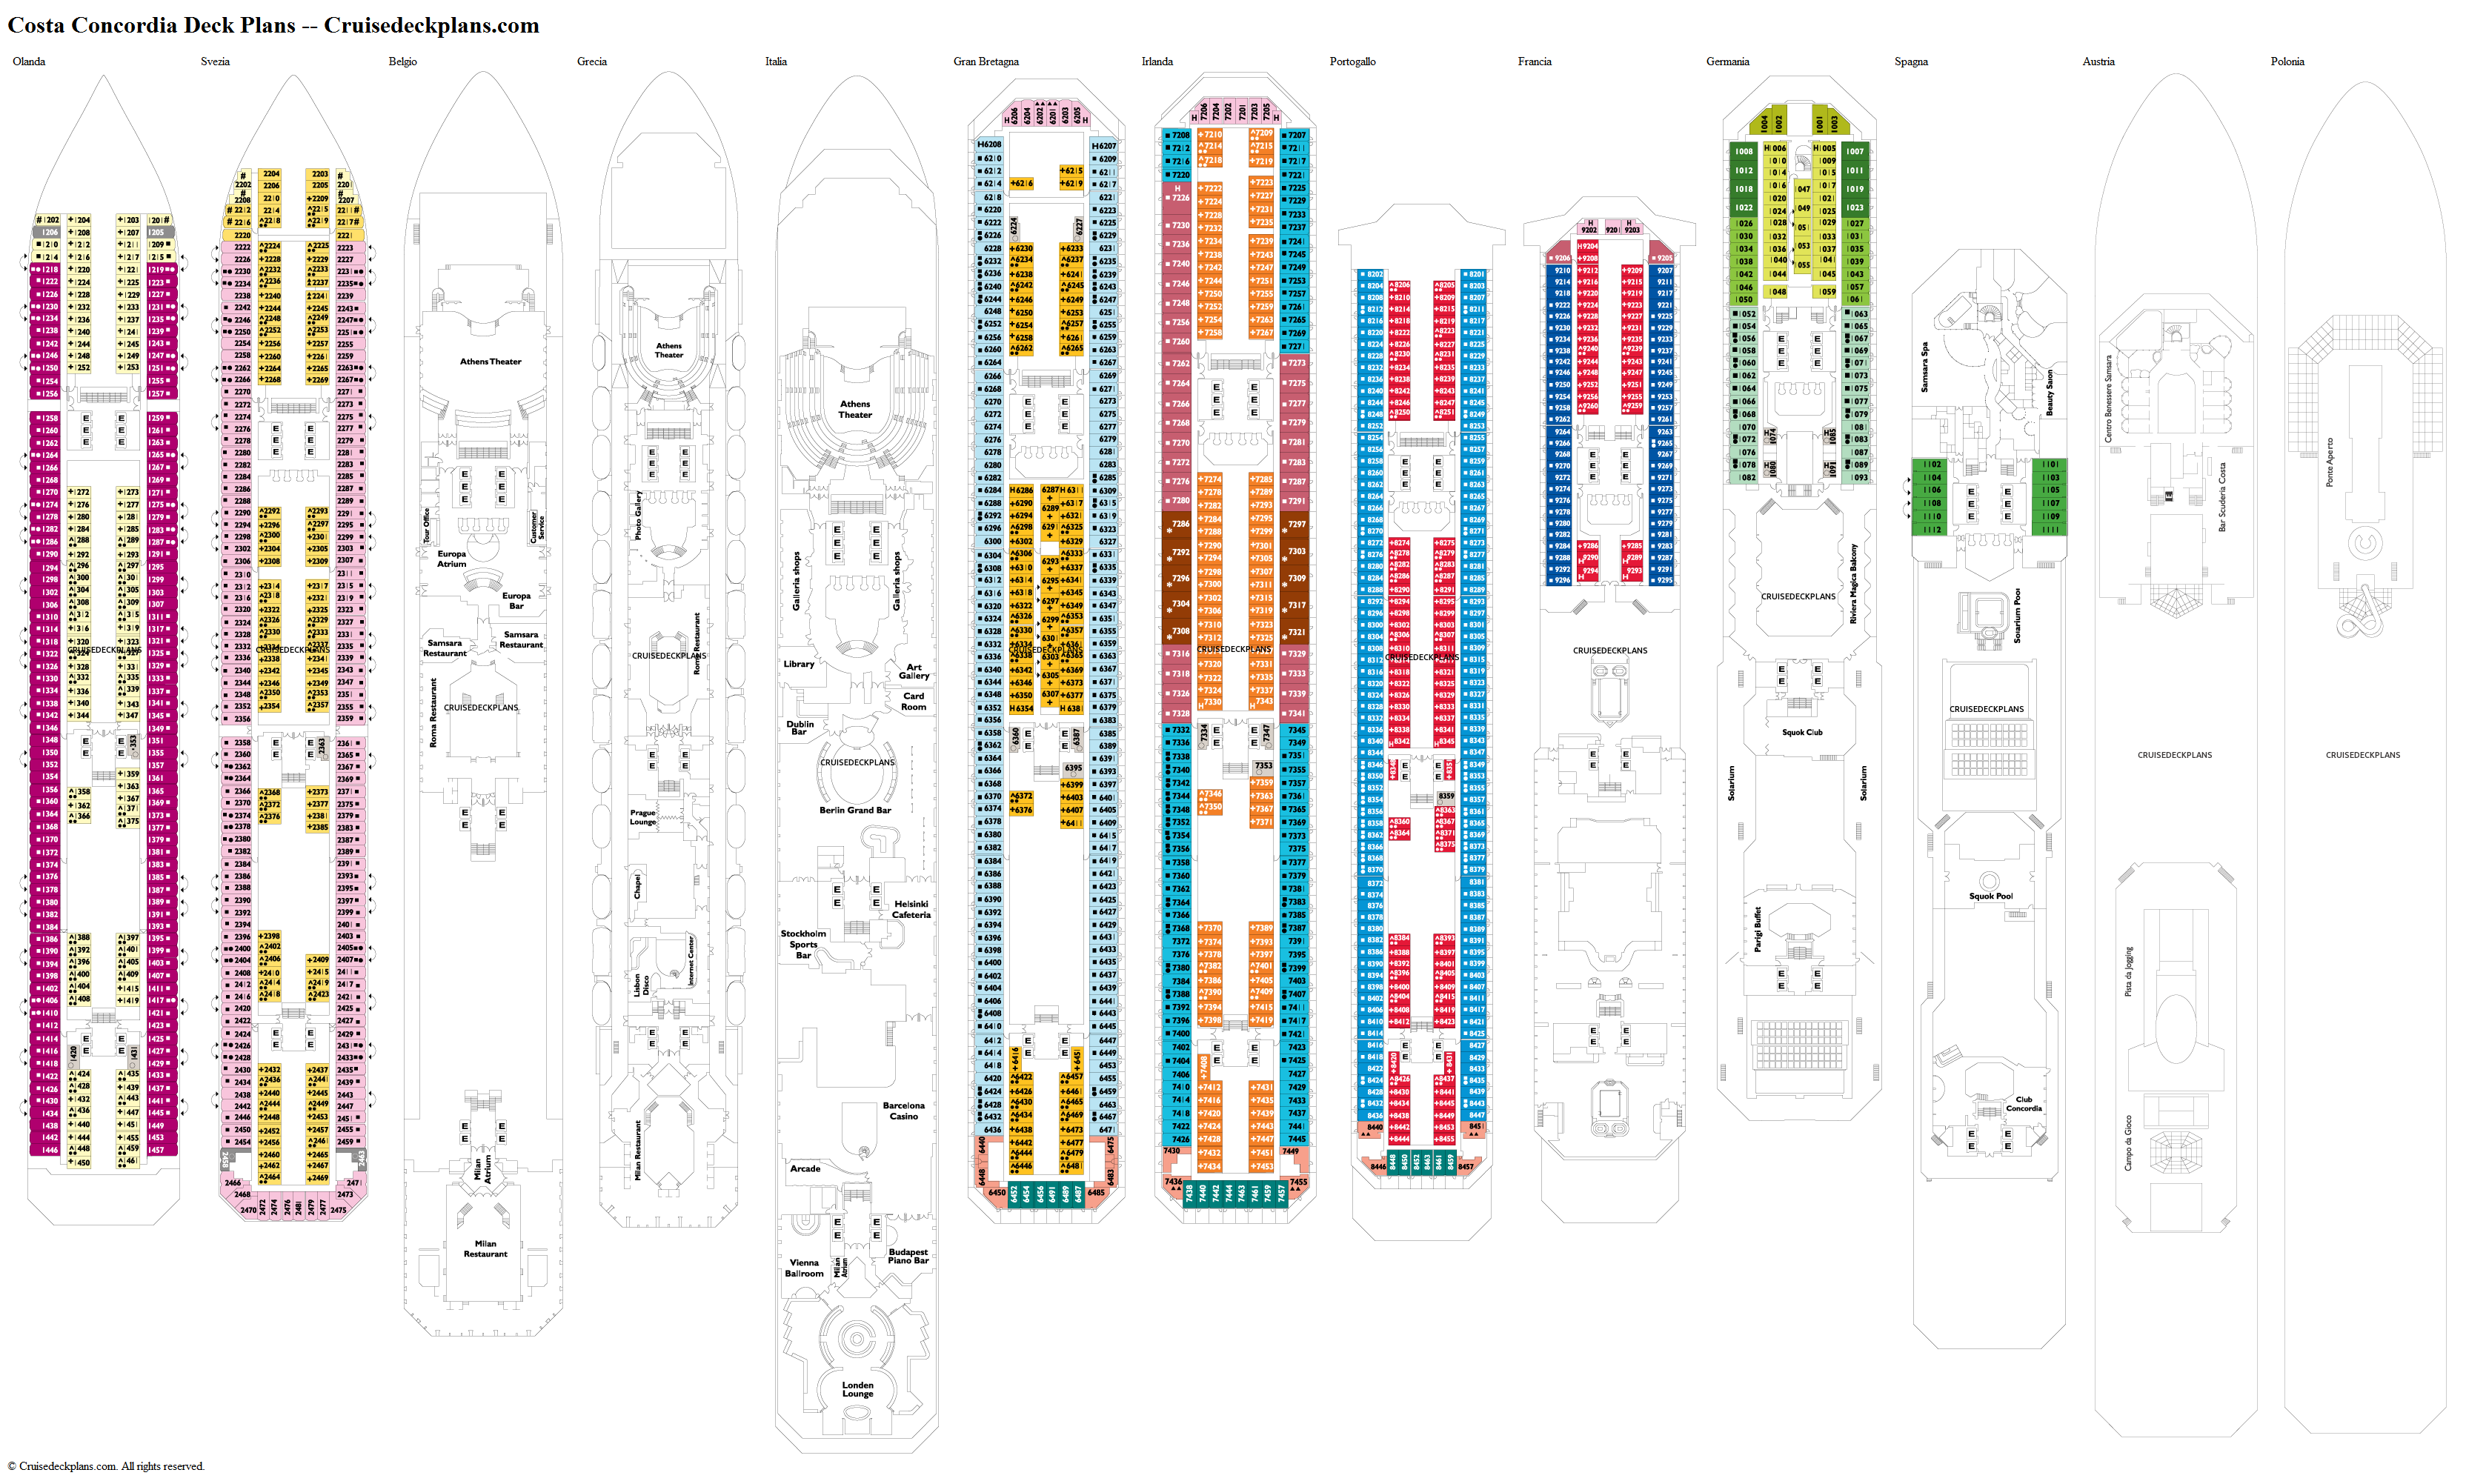 Carnival horizon deck plans